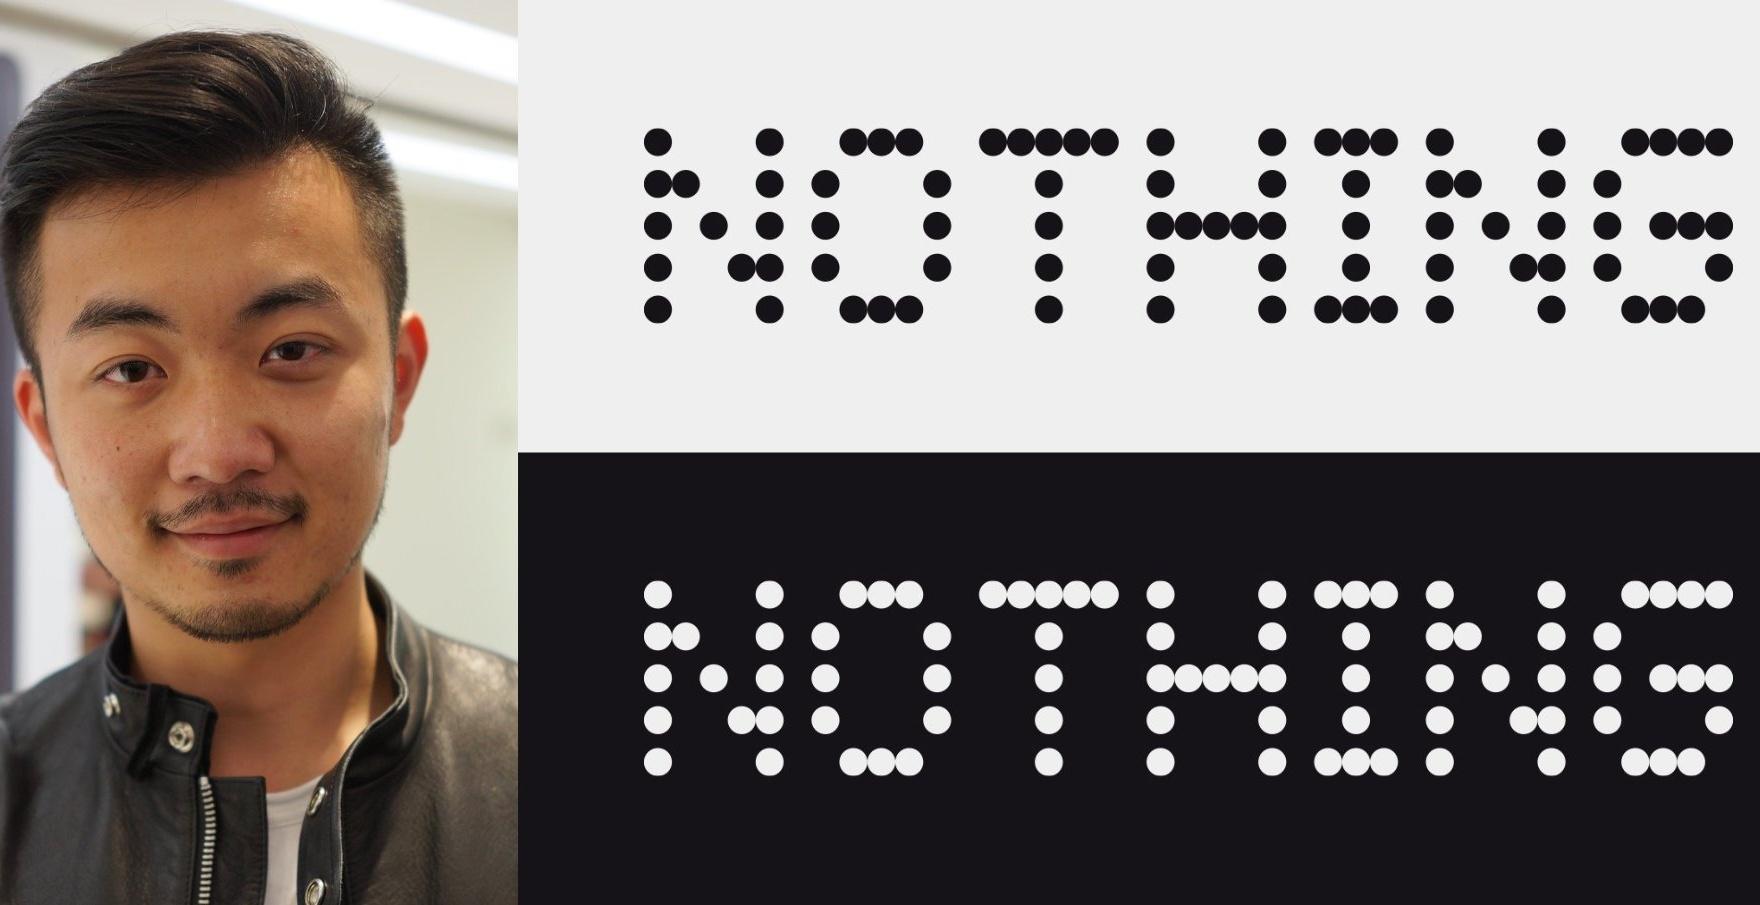 Co-Fondatorul OnePlus, Carl Pei, anunță noua sa companie: Nothing